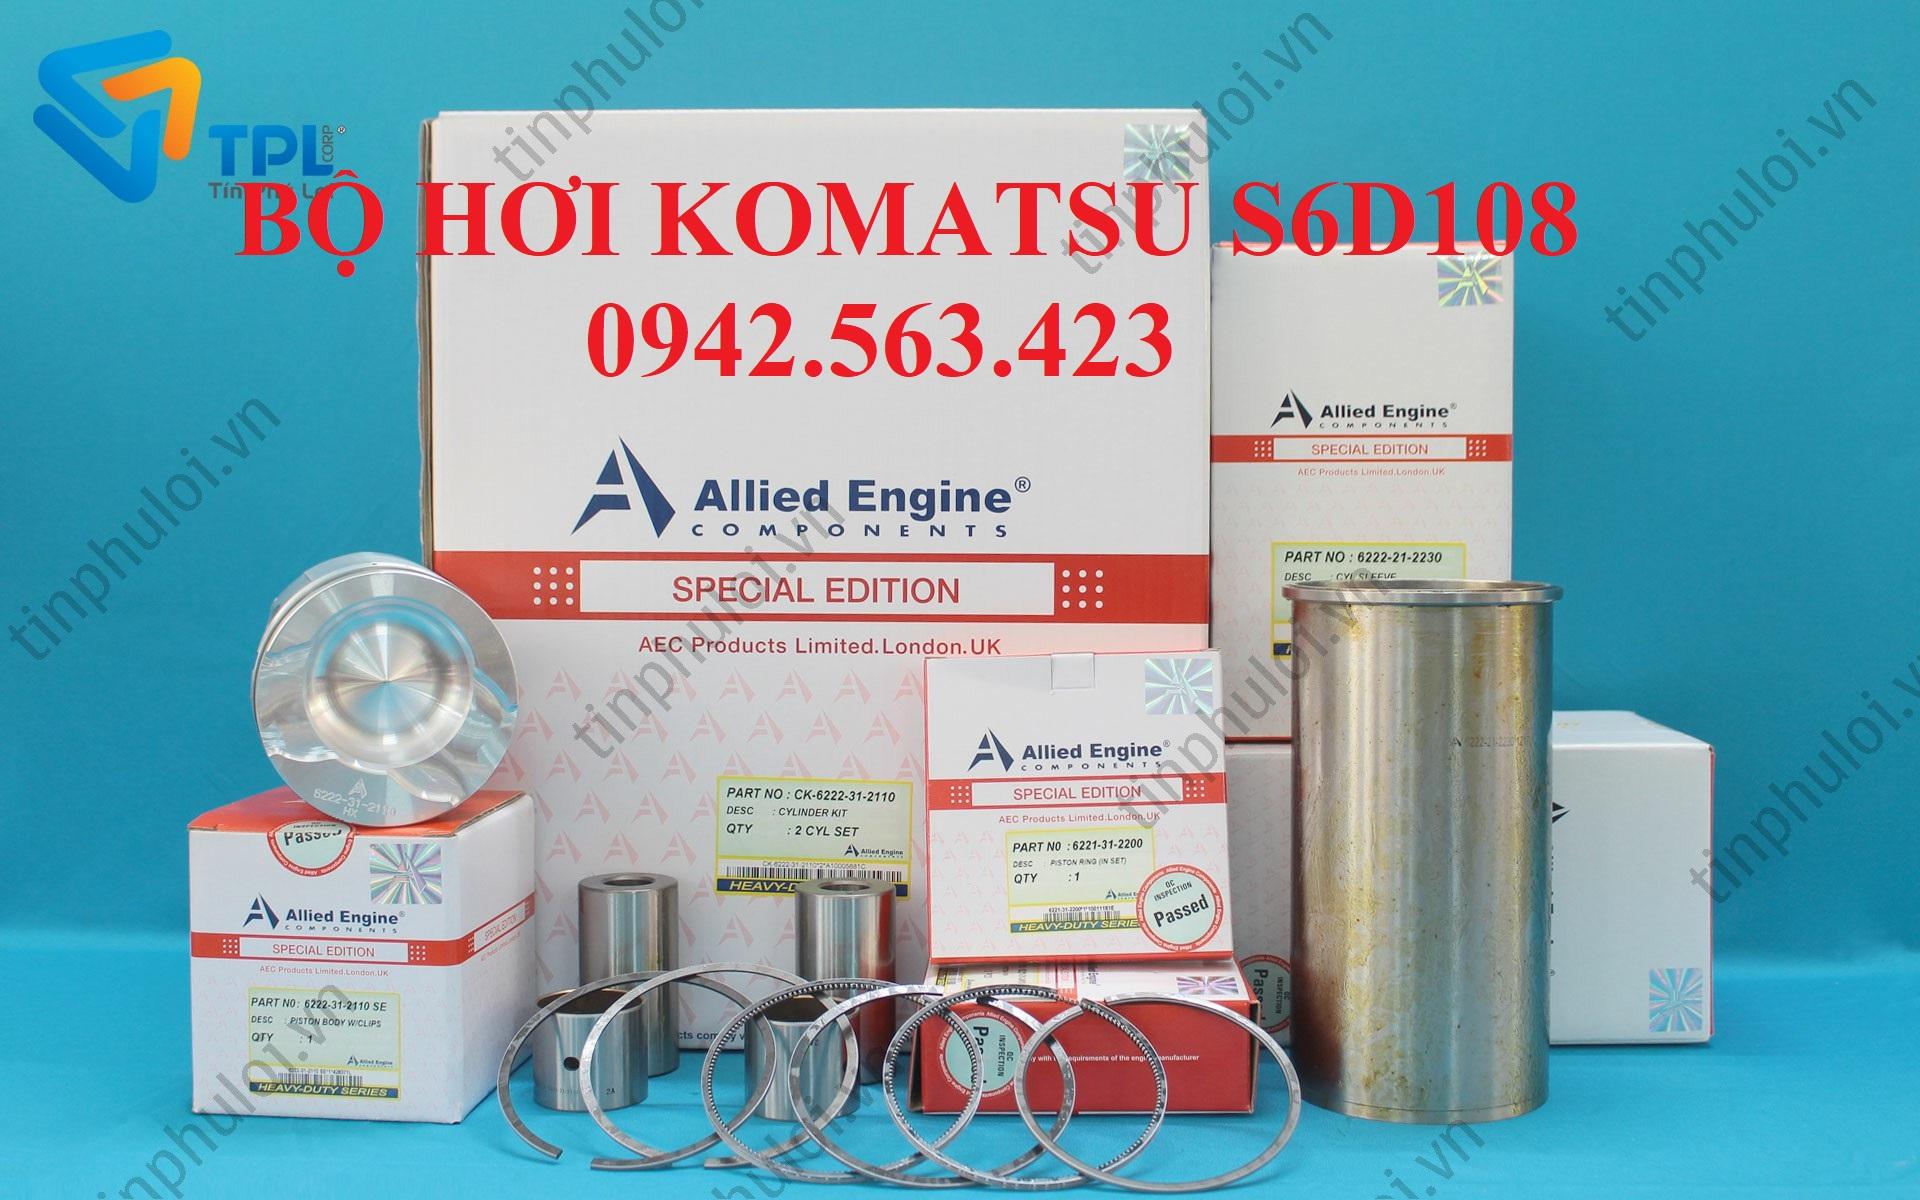 Bộ hơi Komatsu S6D108 -1, Bộ hơi S6D108-1, Bộ hơi S6D108